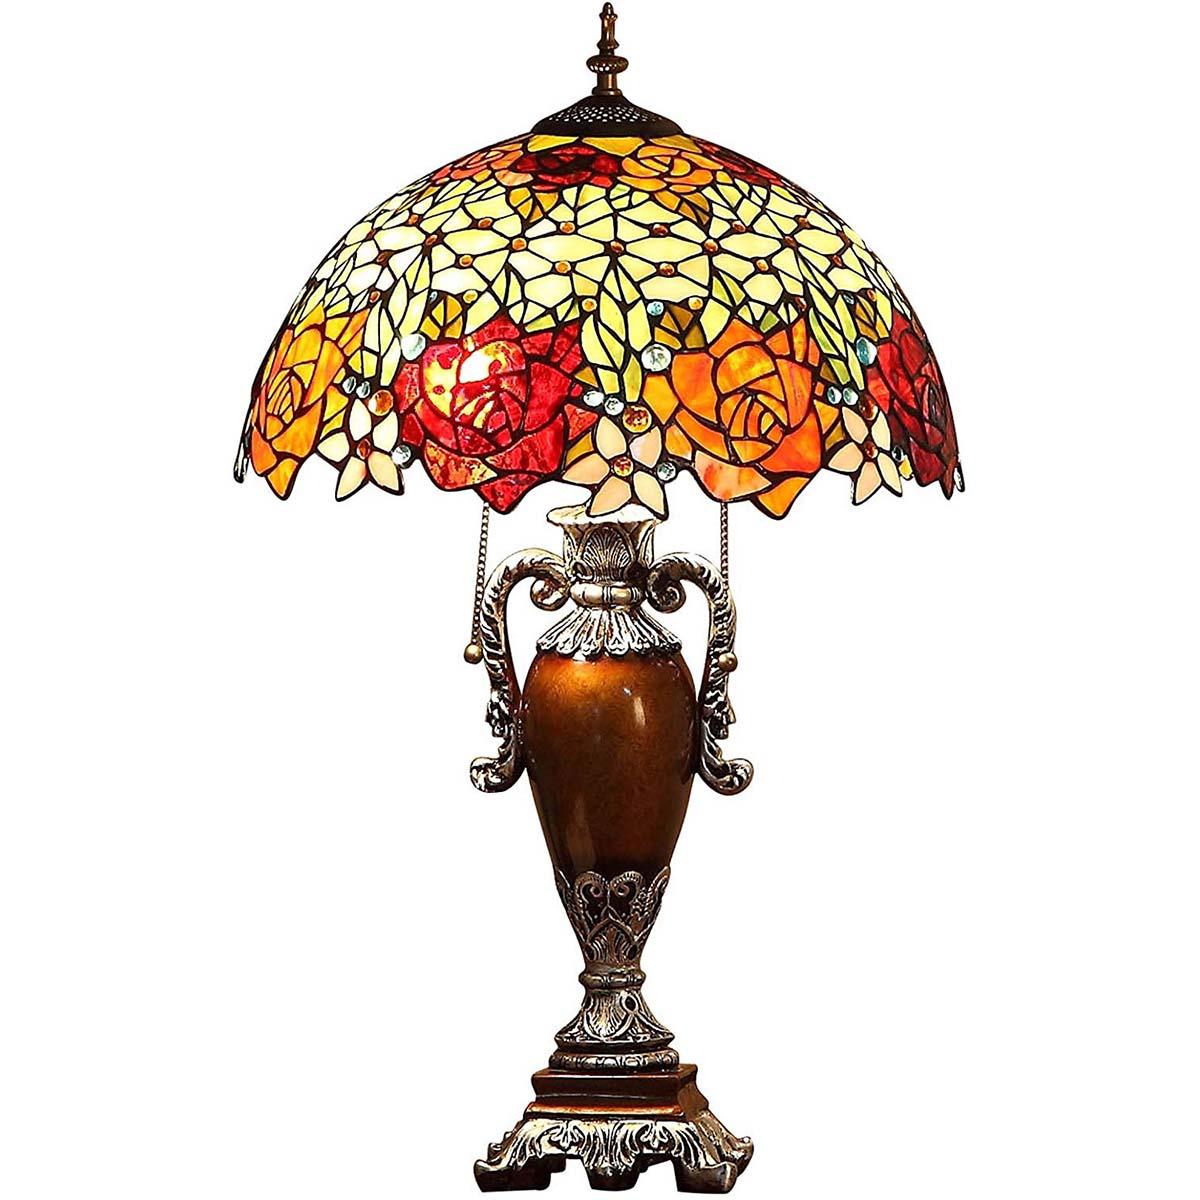 Bieye照明 ステンドグラスランプ インテリアライト 贈り物 雰囲気ランプ 卓上照明 オシャレ 薔薇 ベッドサイドランプ デスクライト 癒しグッズ ロマンチック 枕元スタンド 枕元ライト 彼女に バラ ベッドサイド ステンドグラス